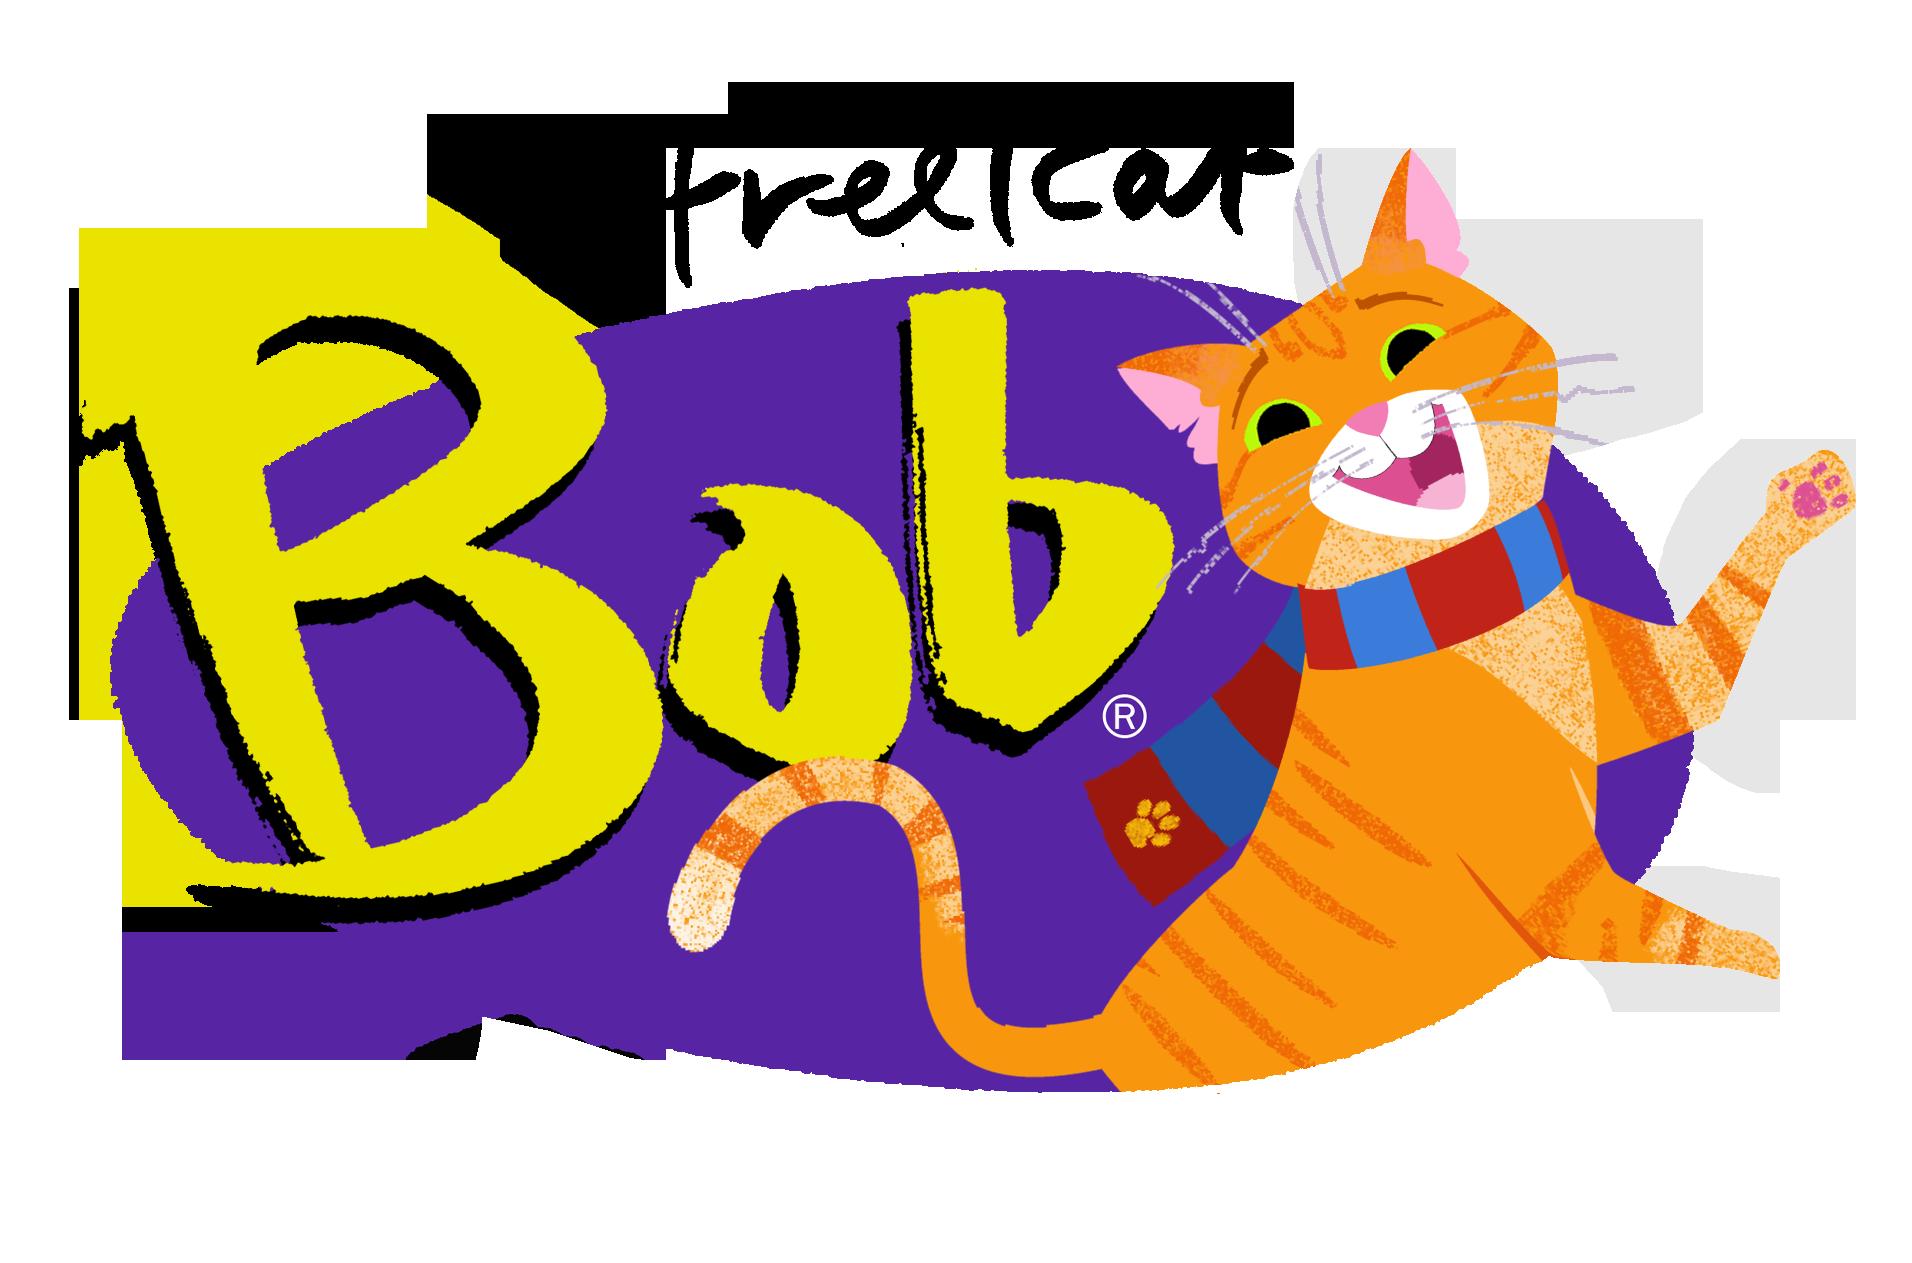 Hi clipart world hello day. Street cat bob explore